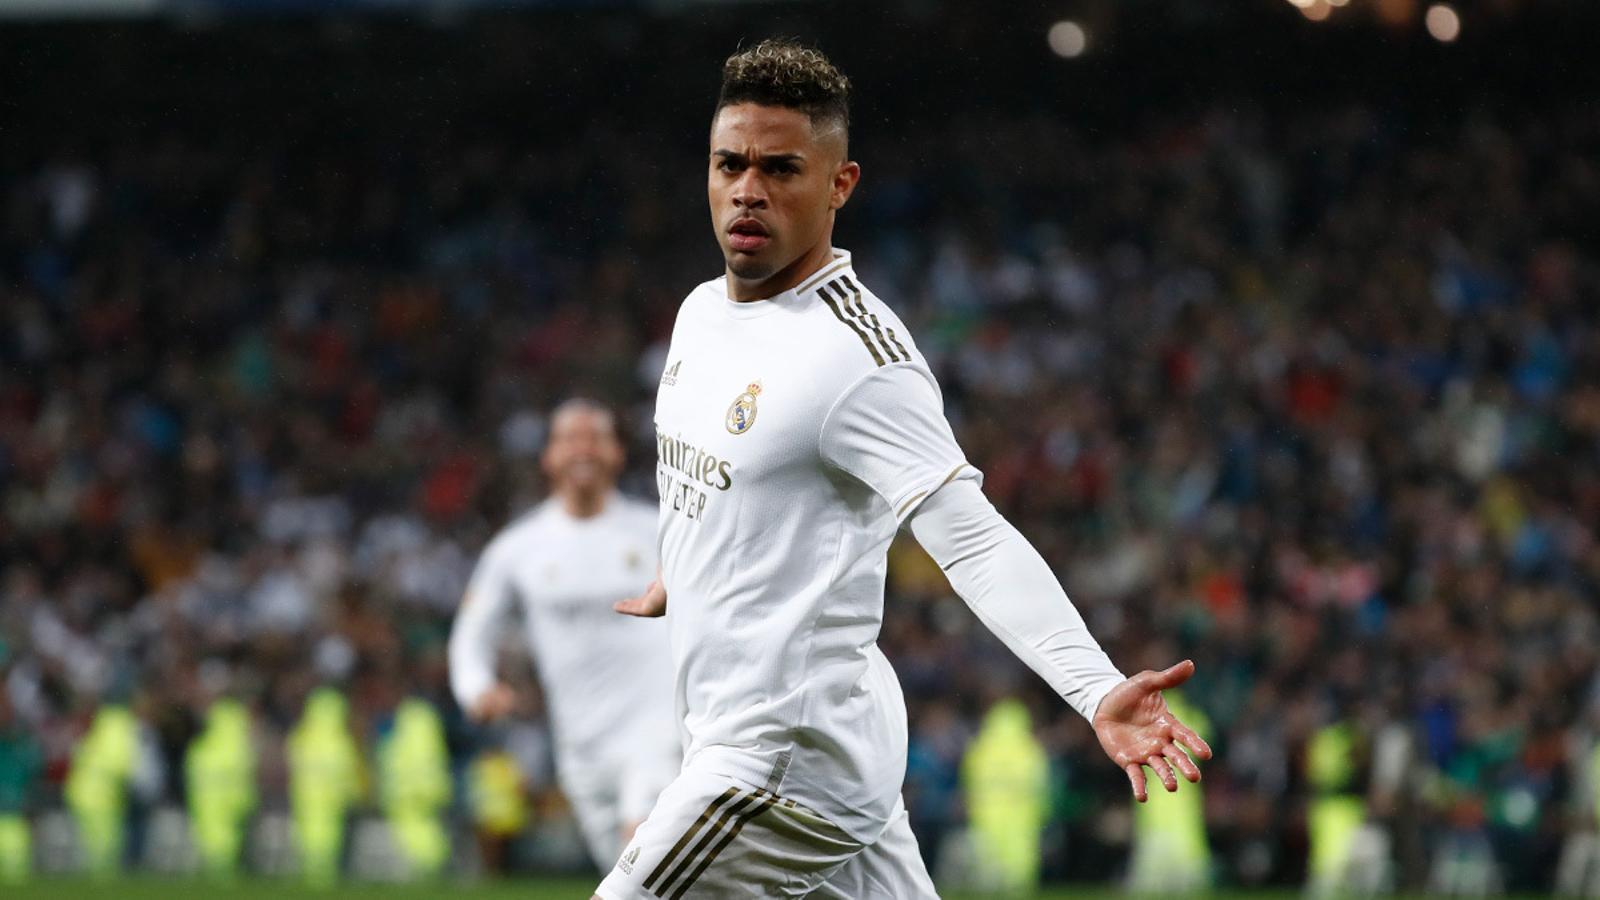 Mariano Díaz, jugador del Real Madrid, positiu per coronavirus